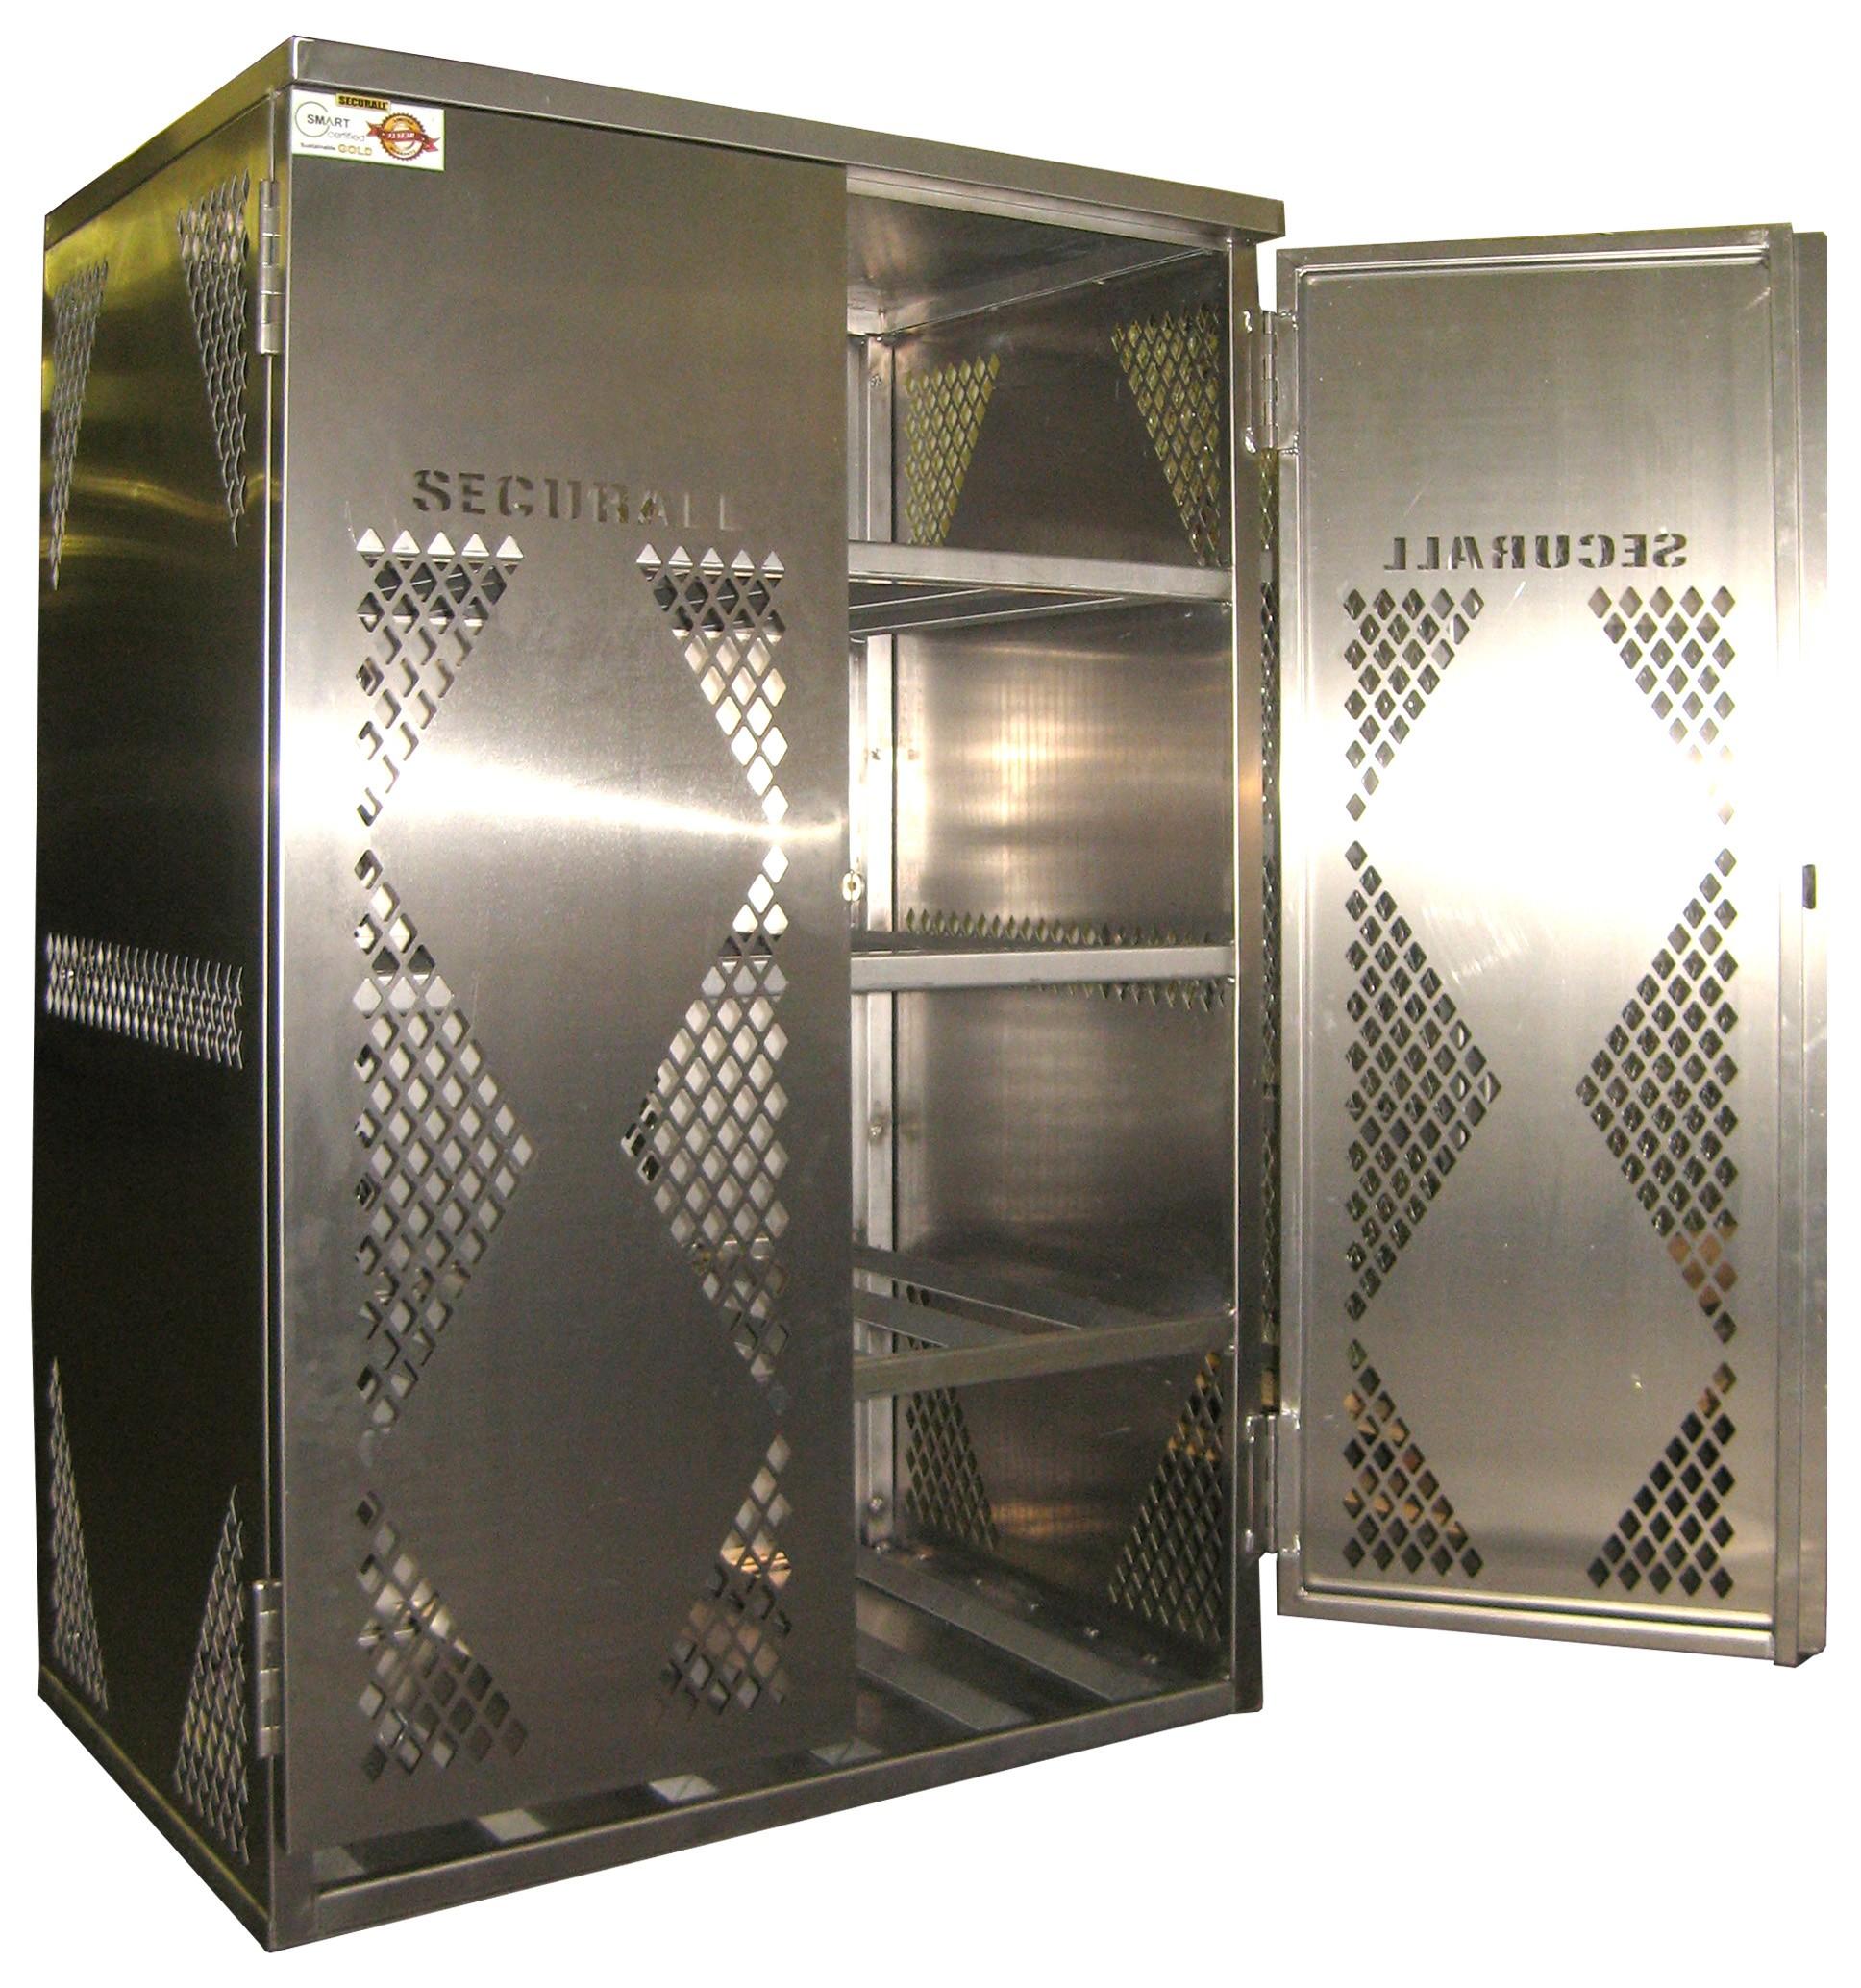 LP12 - LP/Oxygen Storage Cabinet - 12 Cyl. Horizontal Standard 2-Door